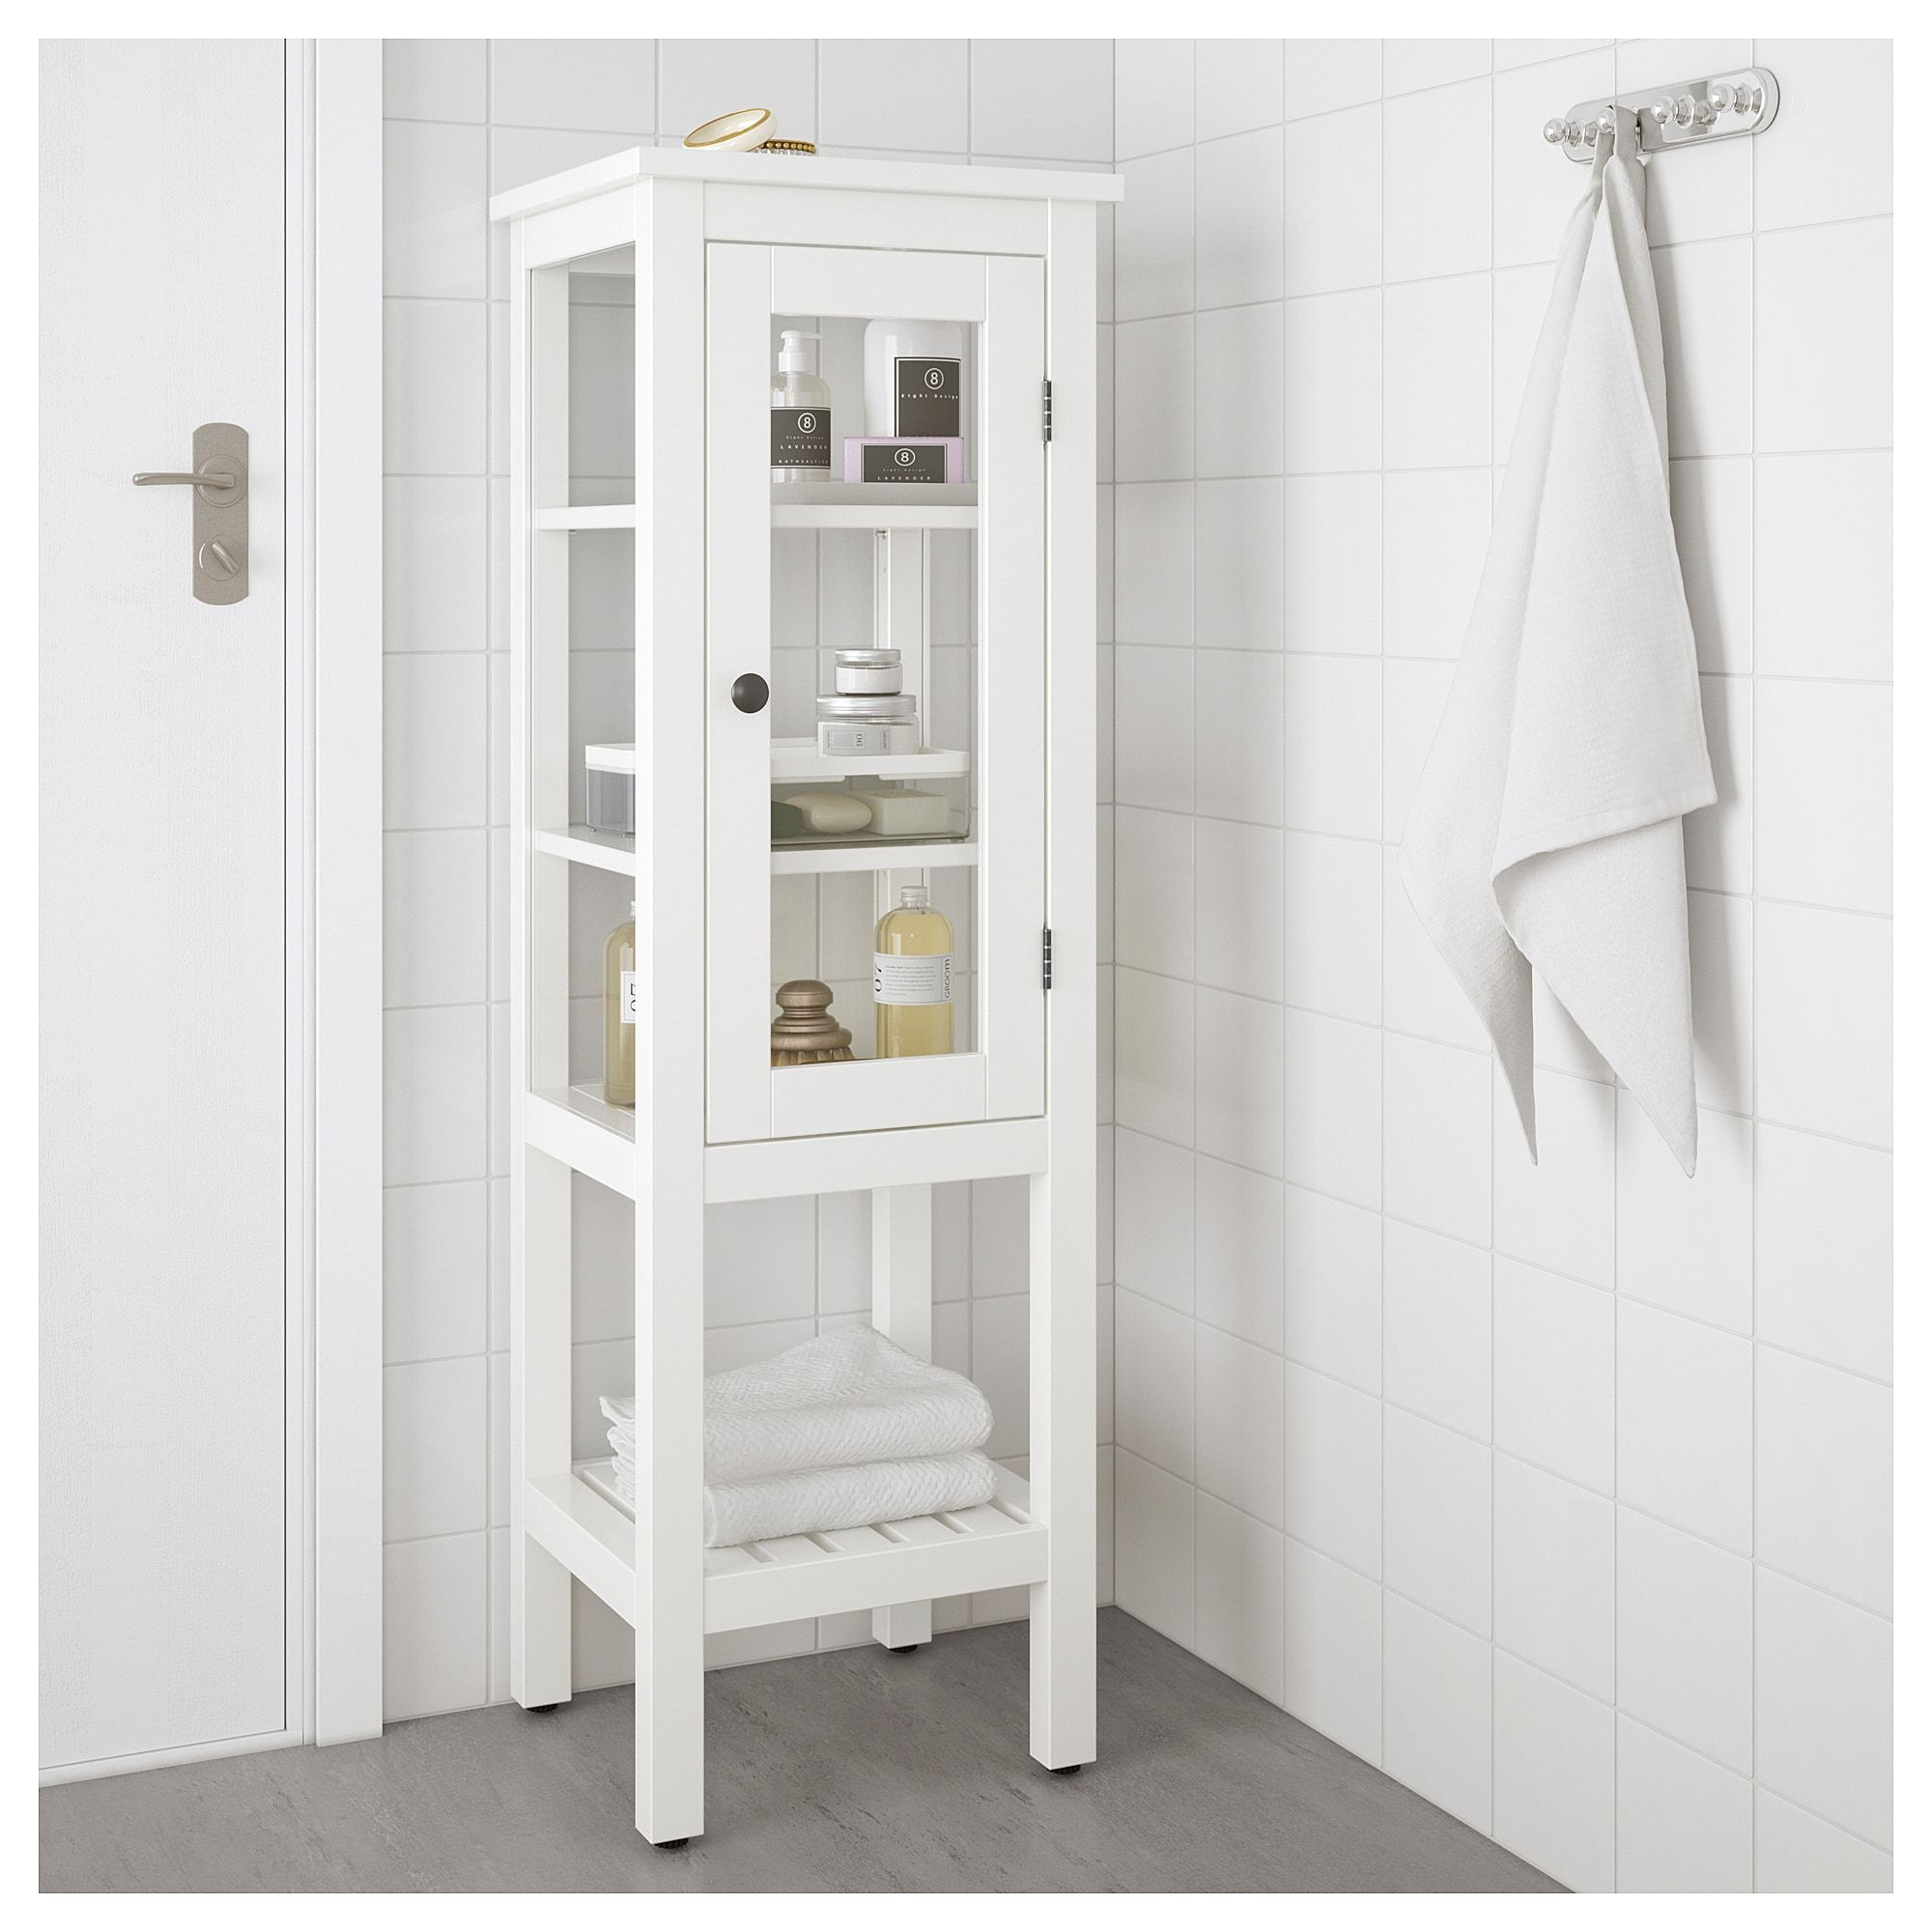 Hemnes High Cabinet With Glass Door White Ikea Glass Cabinet Doors Hemnes Bathroom Tall Cabinet